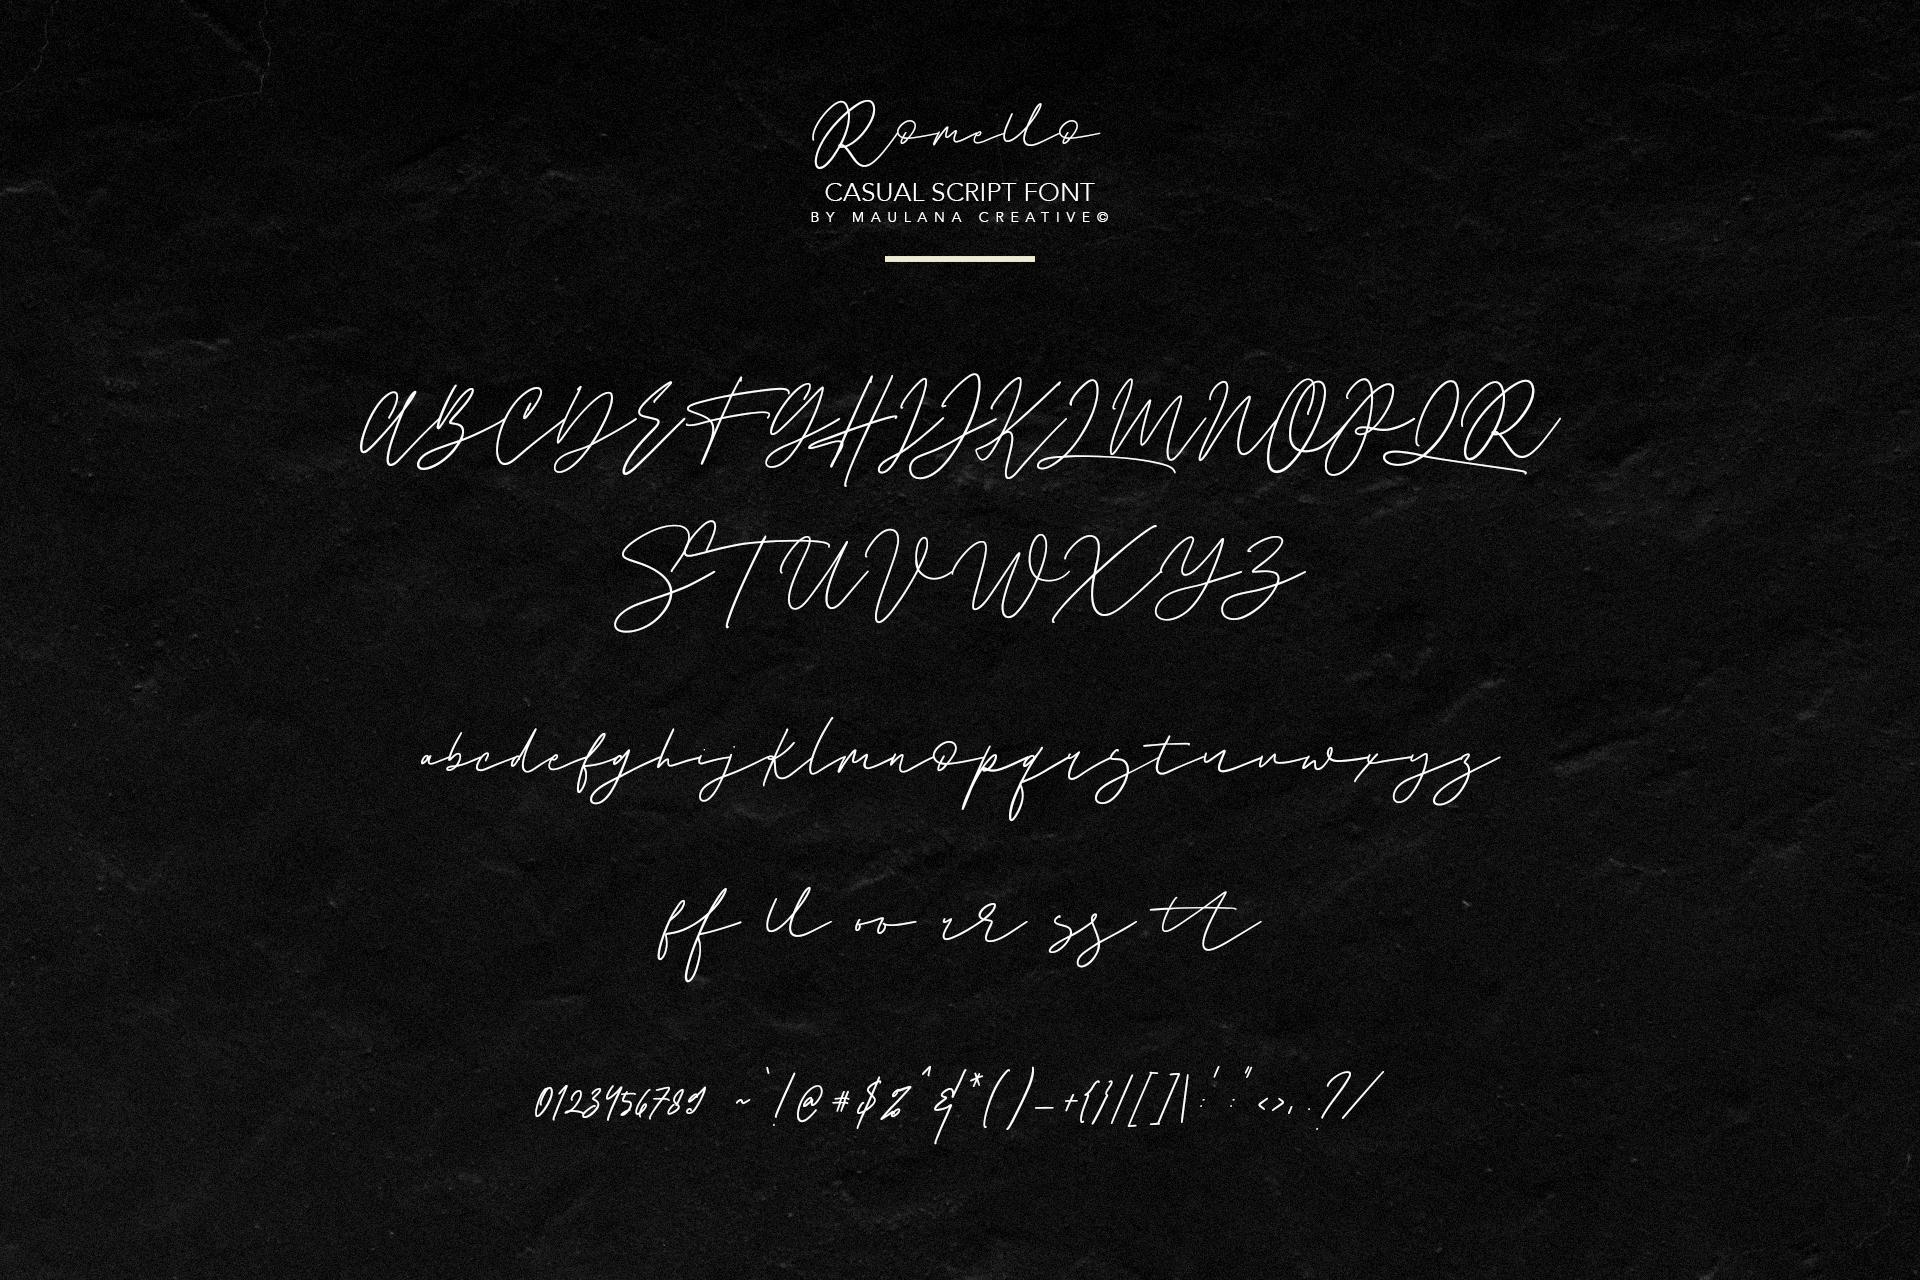 Romello Brush Signature Font example image 10